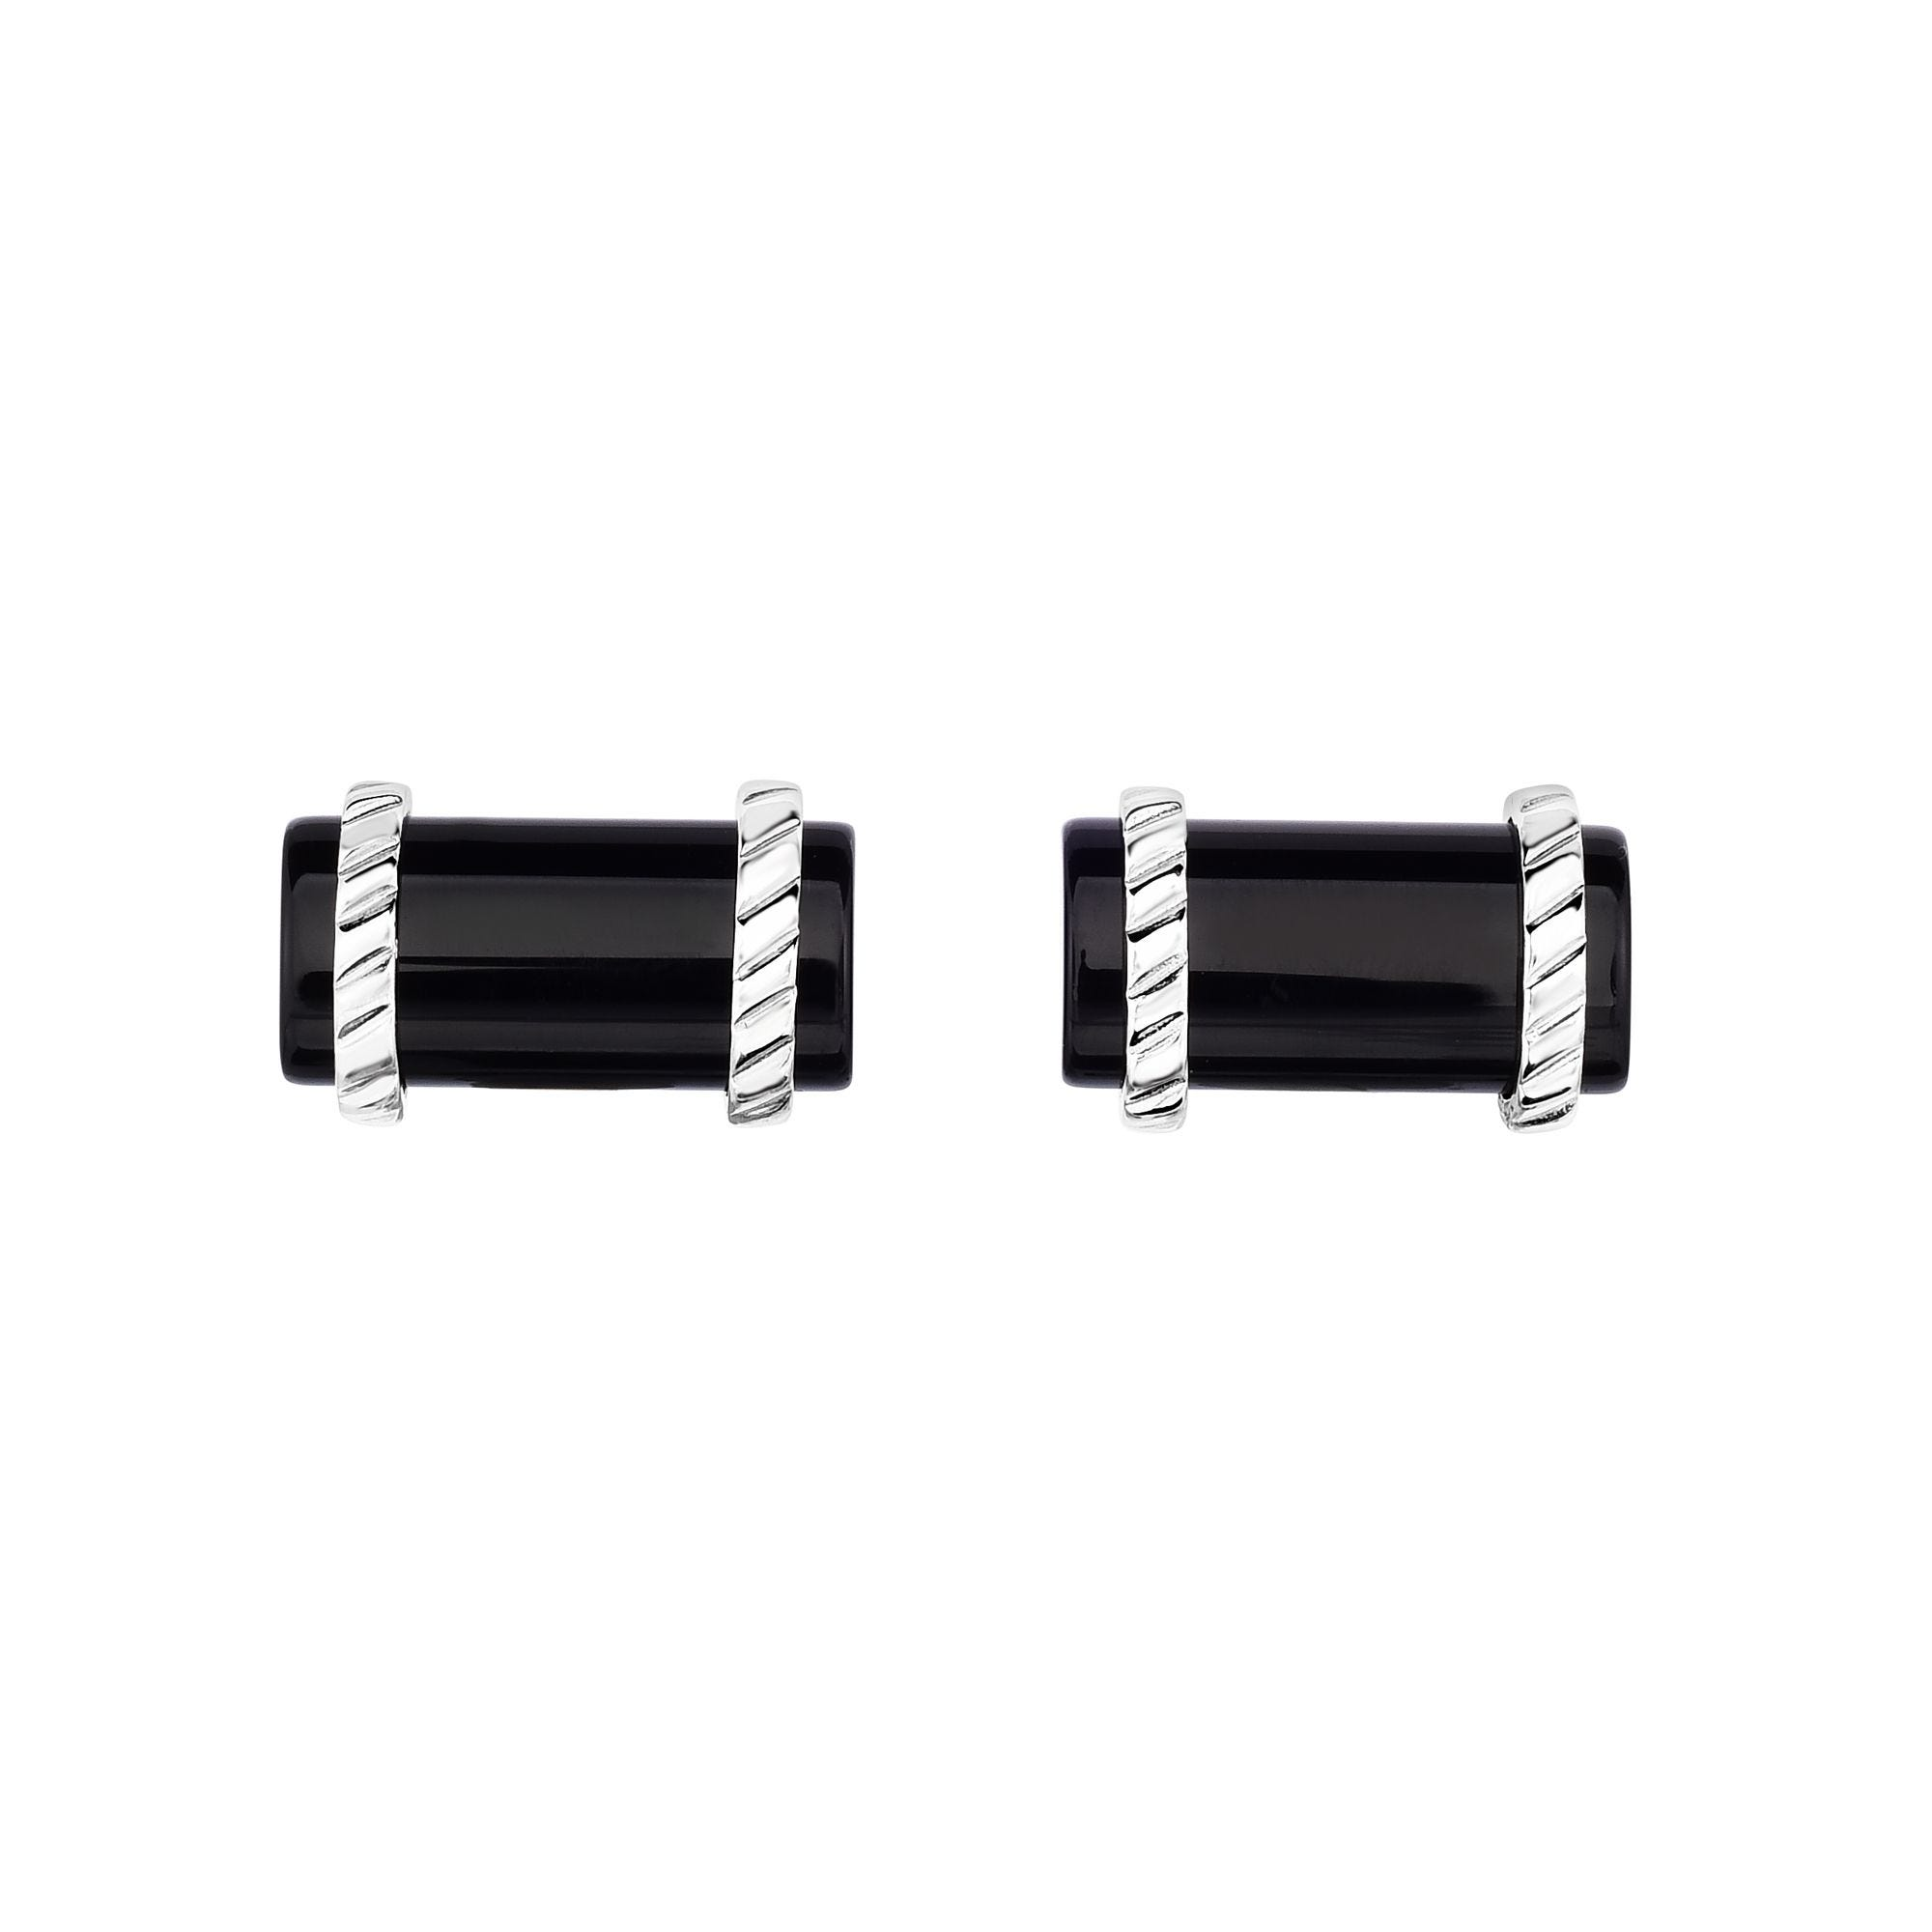 Black Onyx Cylinder Cufflinks 22x13mm in Sterling Silver